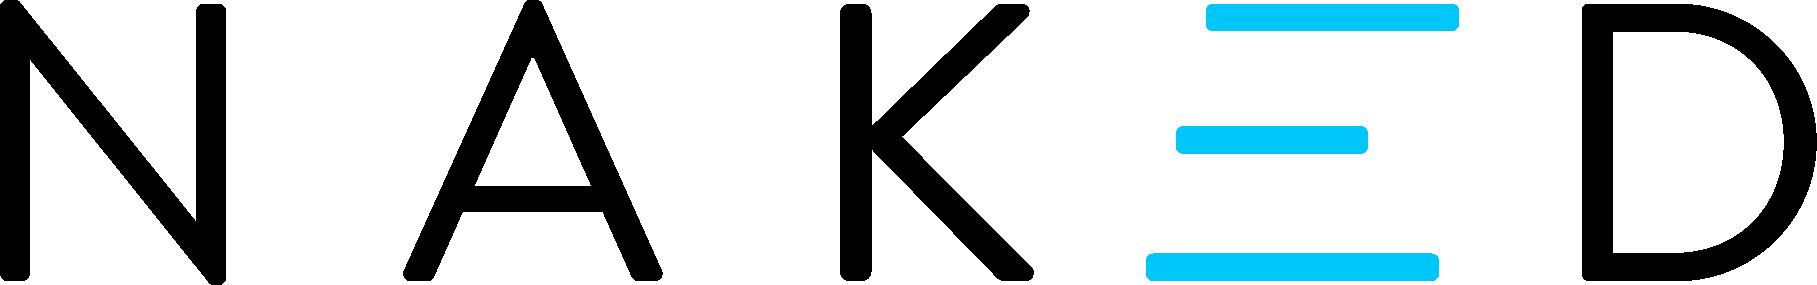 Naked Labs logo